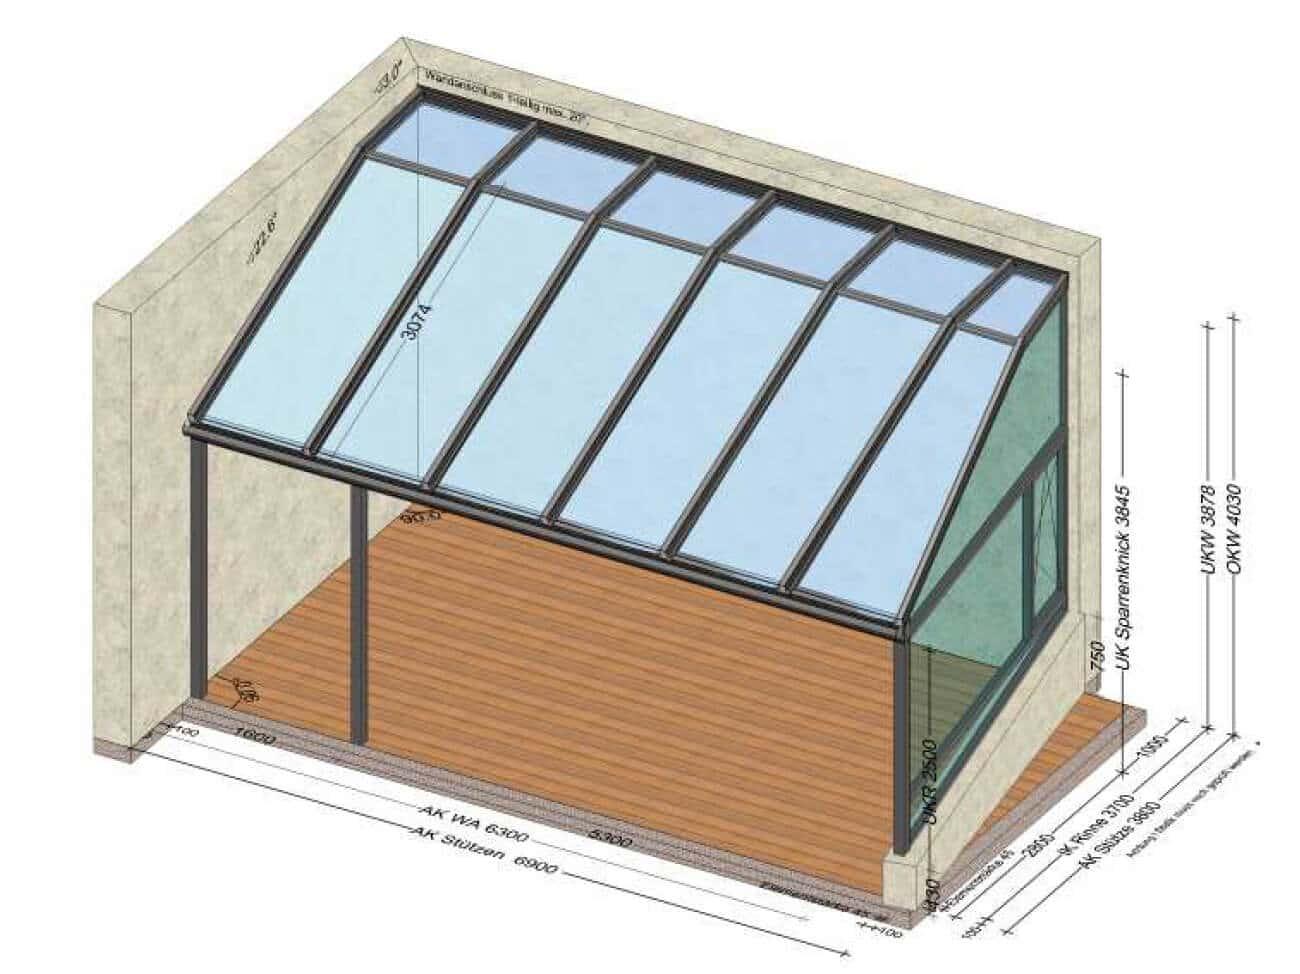 Terrassenüberdachung mit Solarknick - Sonderkonstruktion / Planung